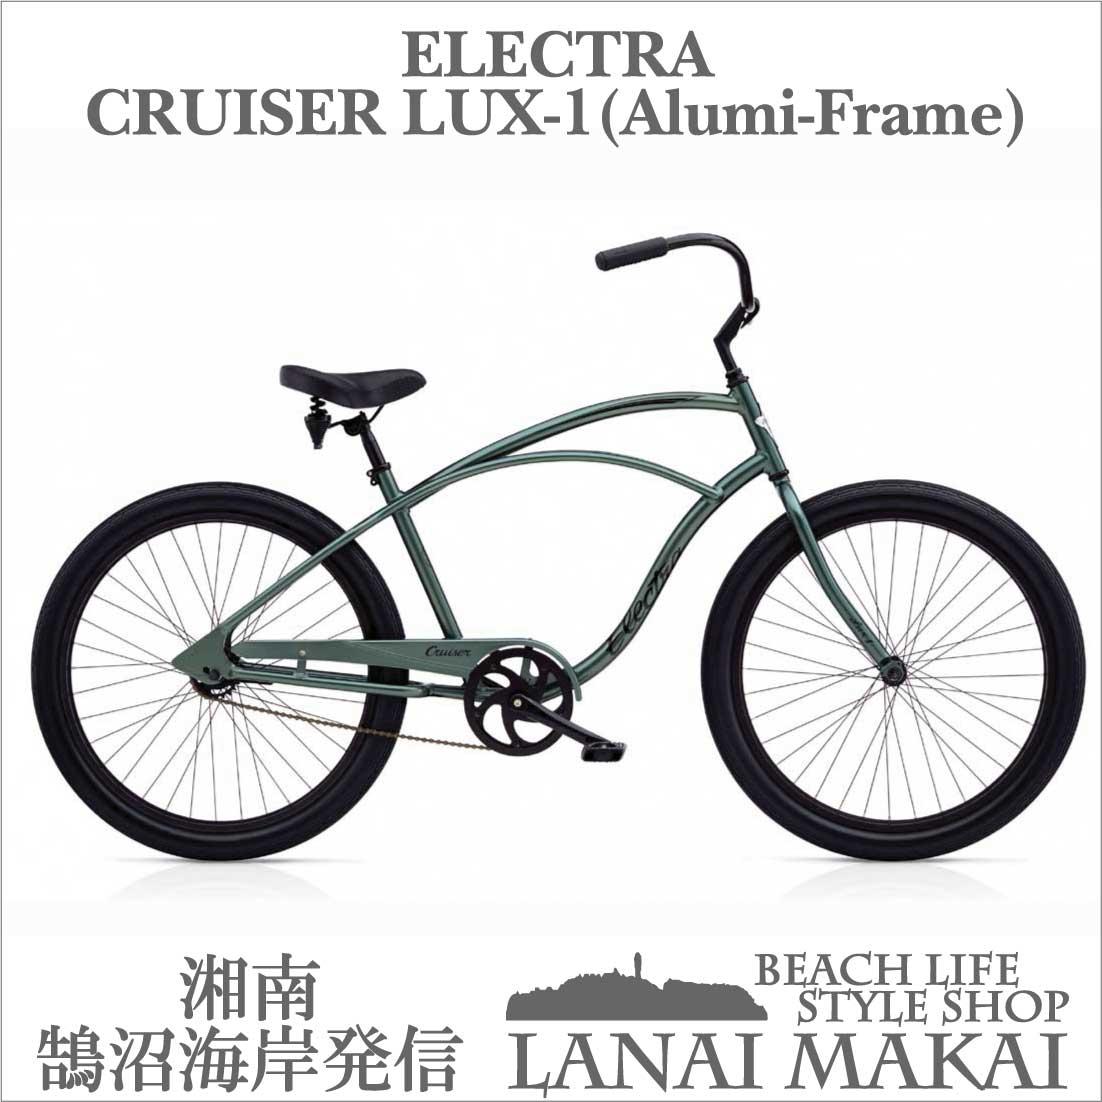 "【MODEL】エレクトラ ""ELECTRA CRUISER LUX1 Anthracite""""湘南鵠沼海岸発信""《ELECTR BEACH CRUISER ""ELECTRA CRUISER LUX1 Anthracite""》ビーチクルーザー 26インチ 自転車 メンズ レディース ファットバイク"